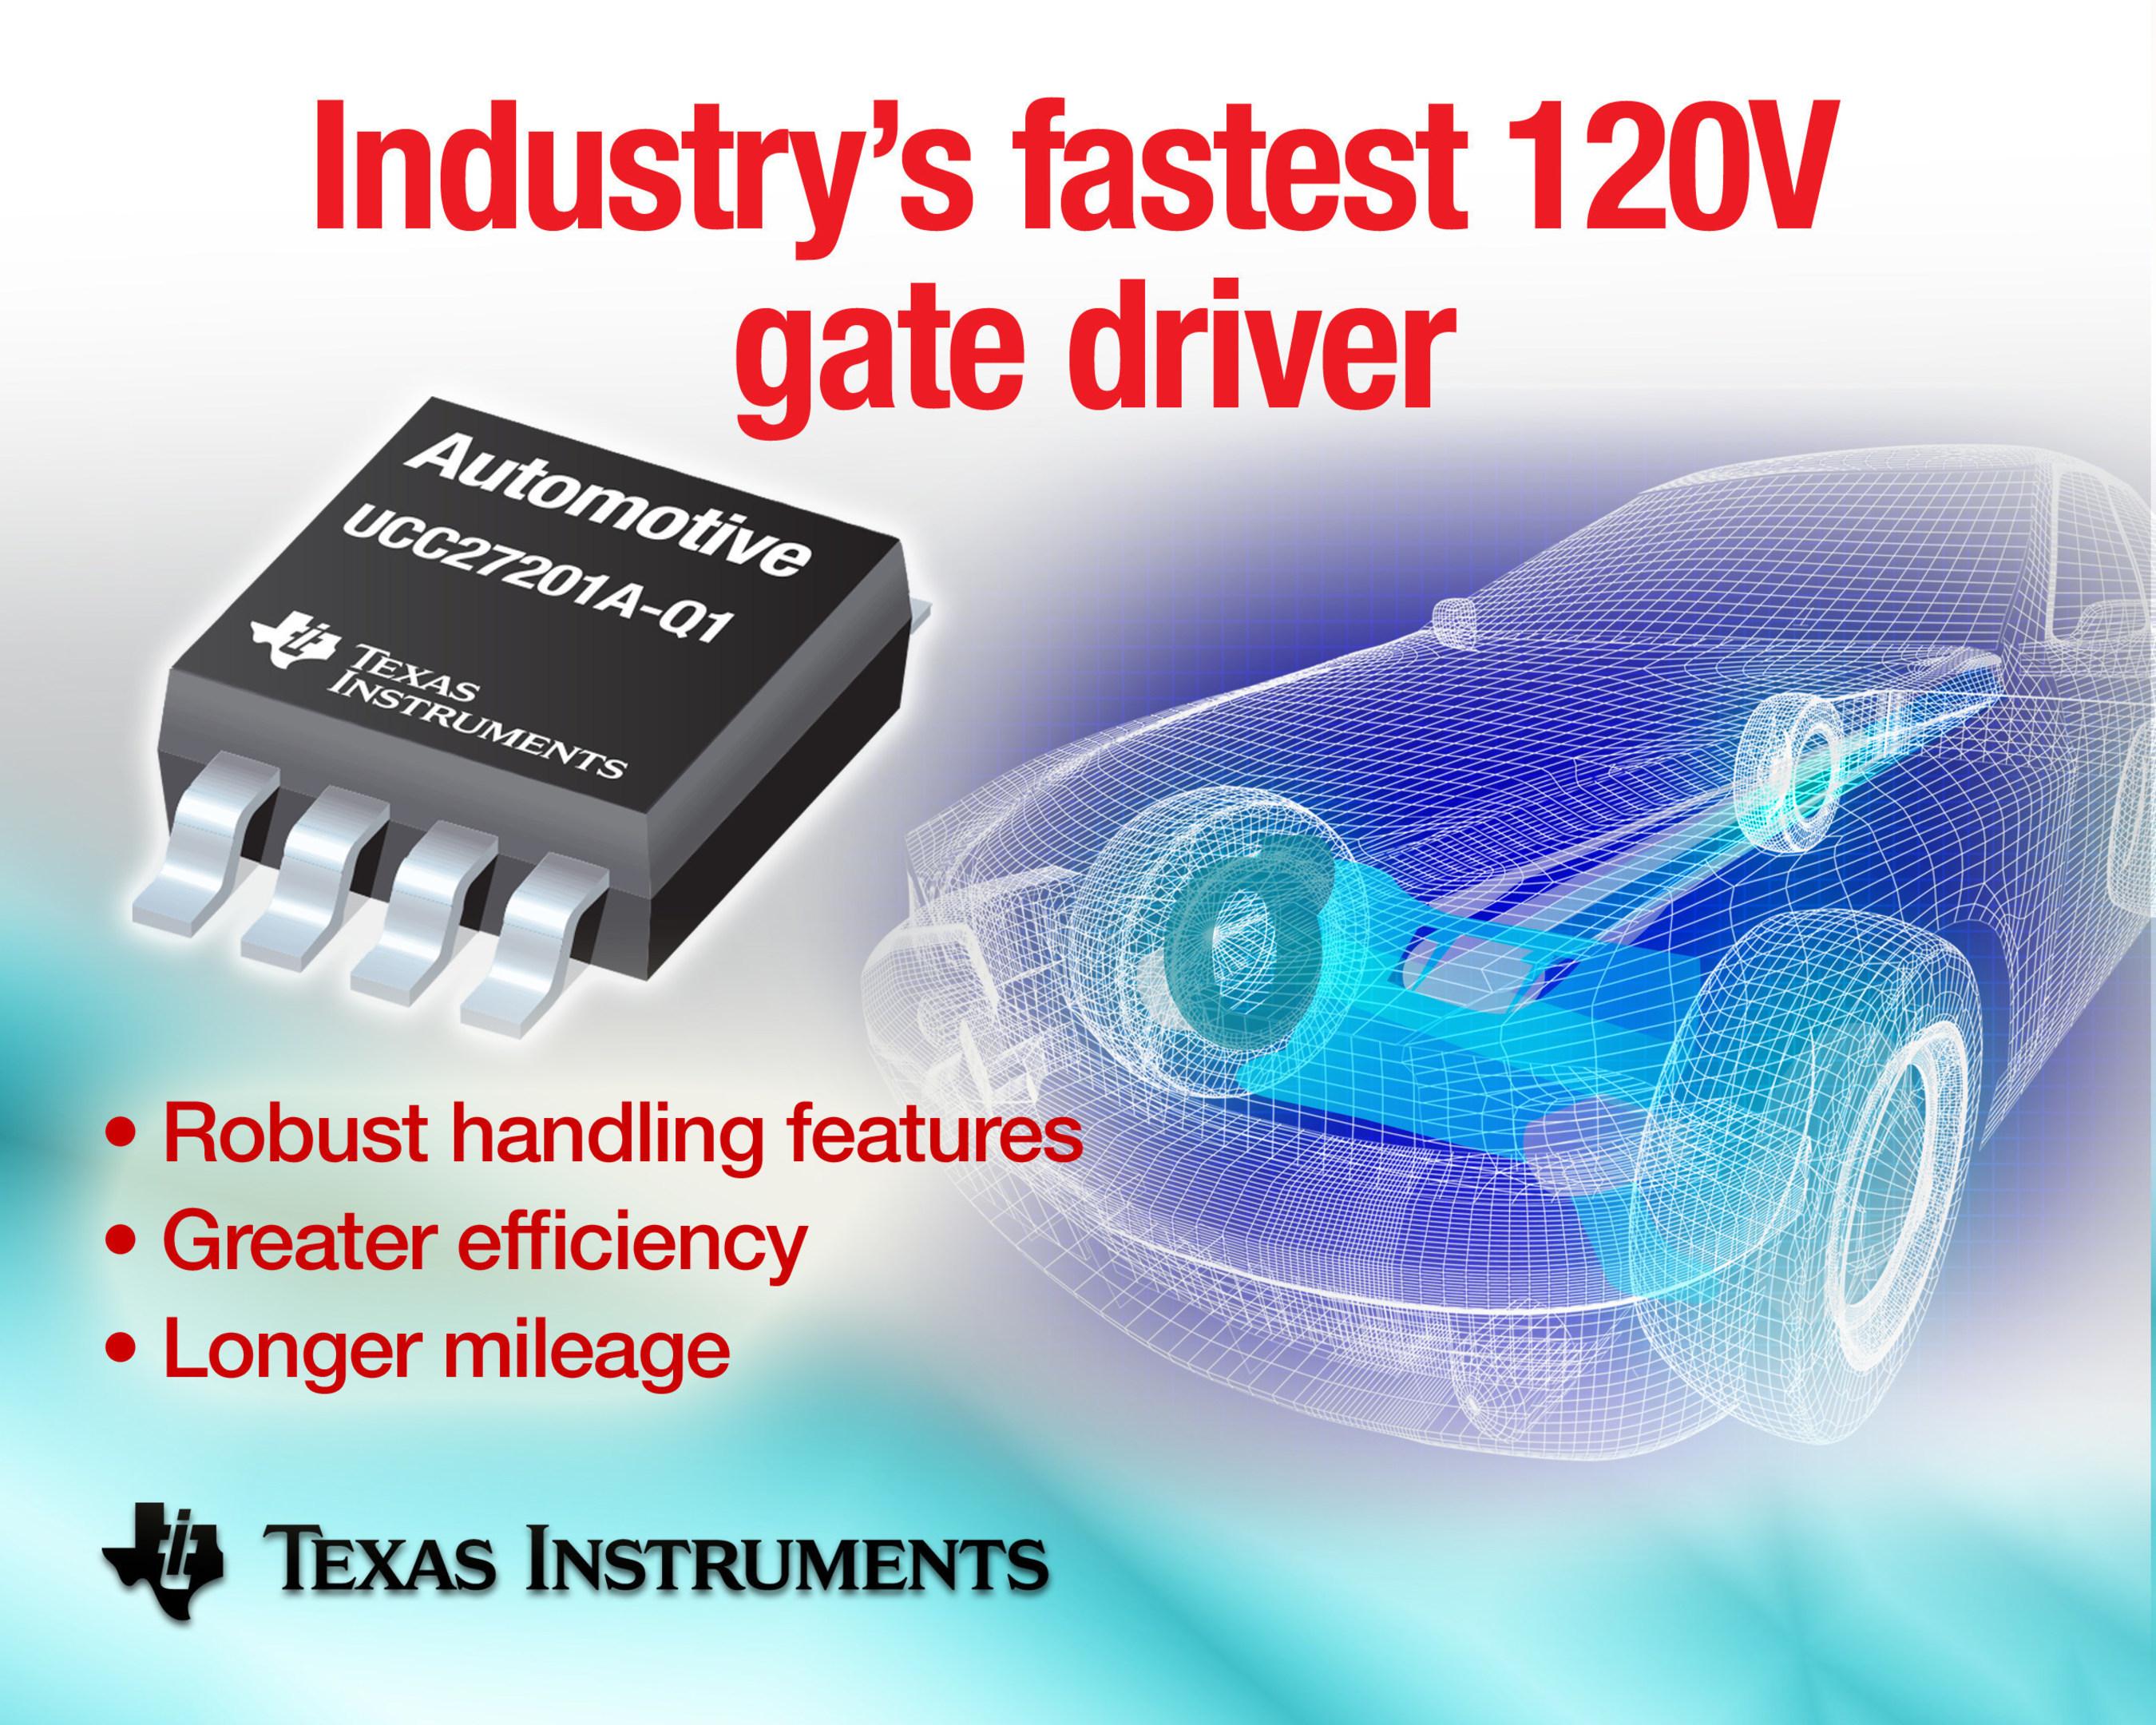 TI half-bridge gate driver improves power system performance in hybrid vehicles